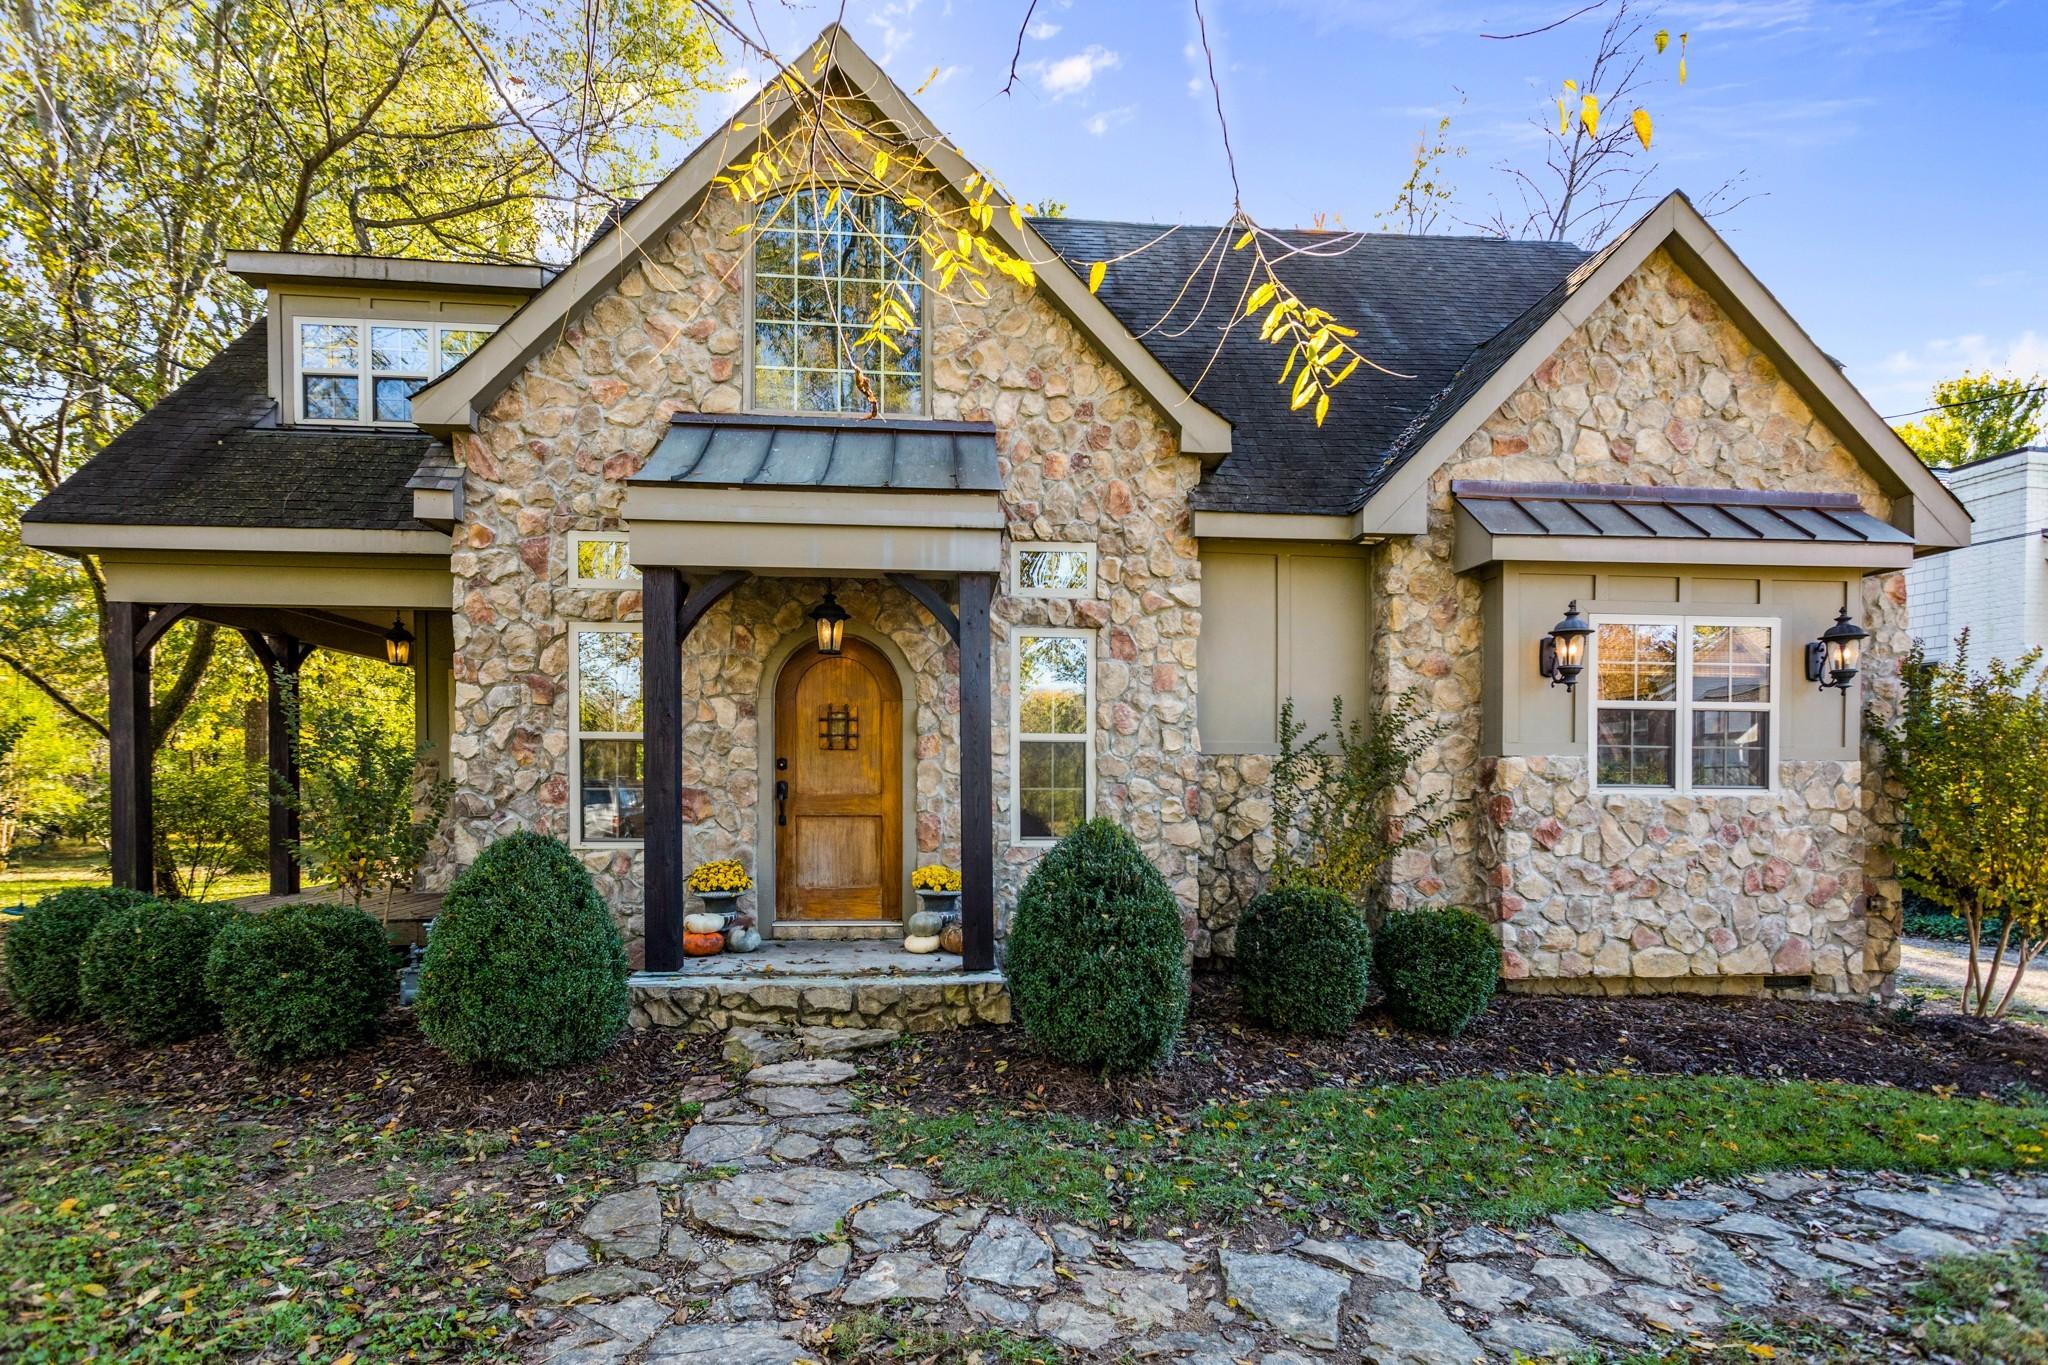 2534 Miami Ave, Nashville, TN 37214 - Nashville, TN real estate listing